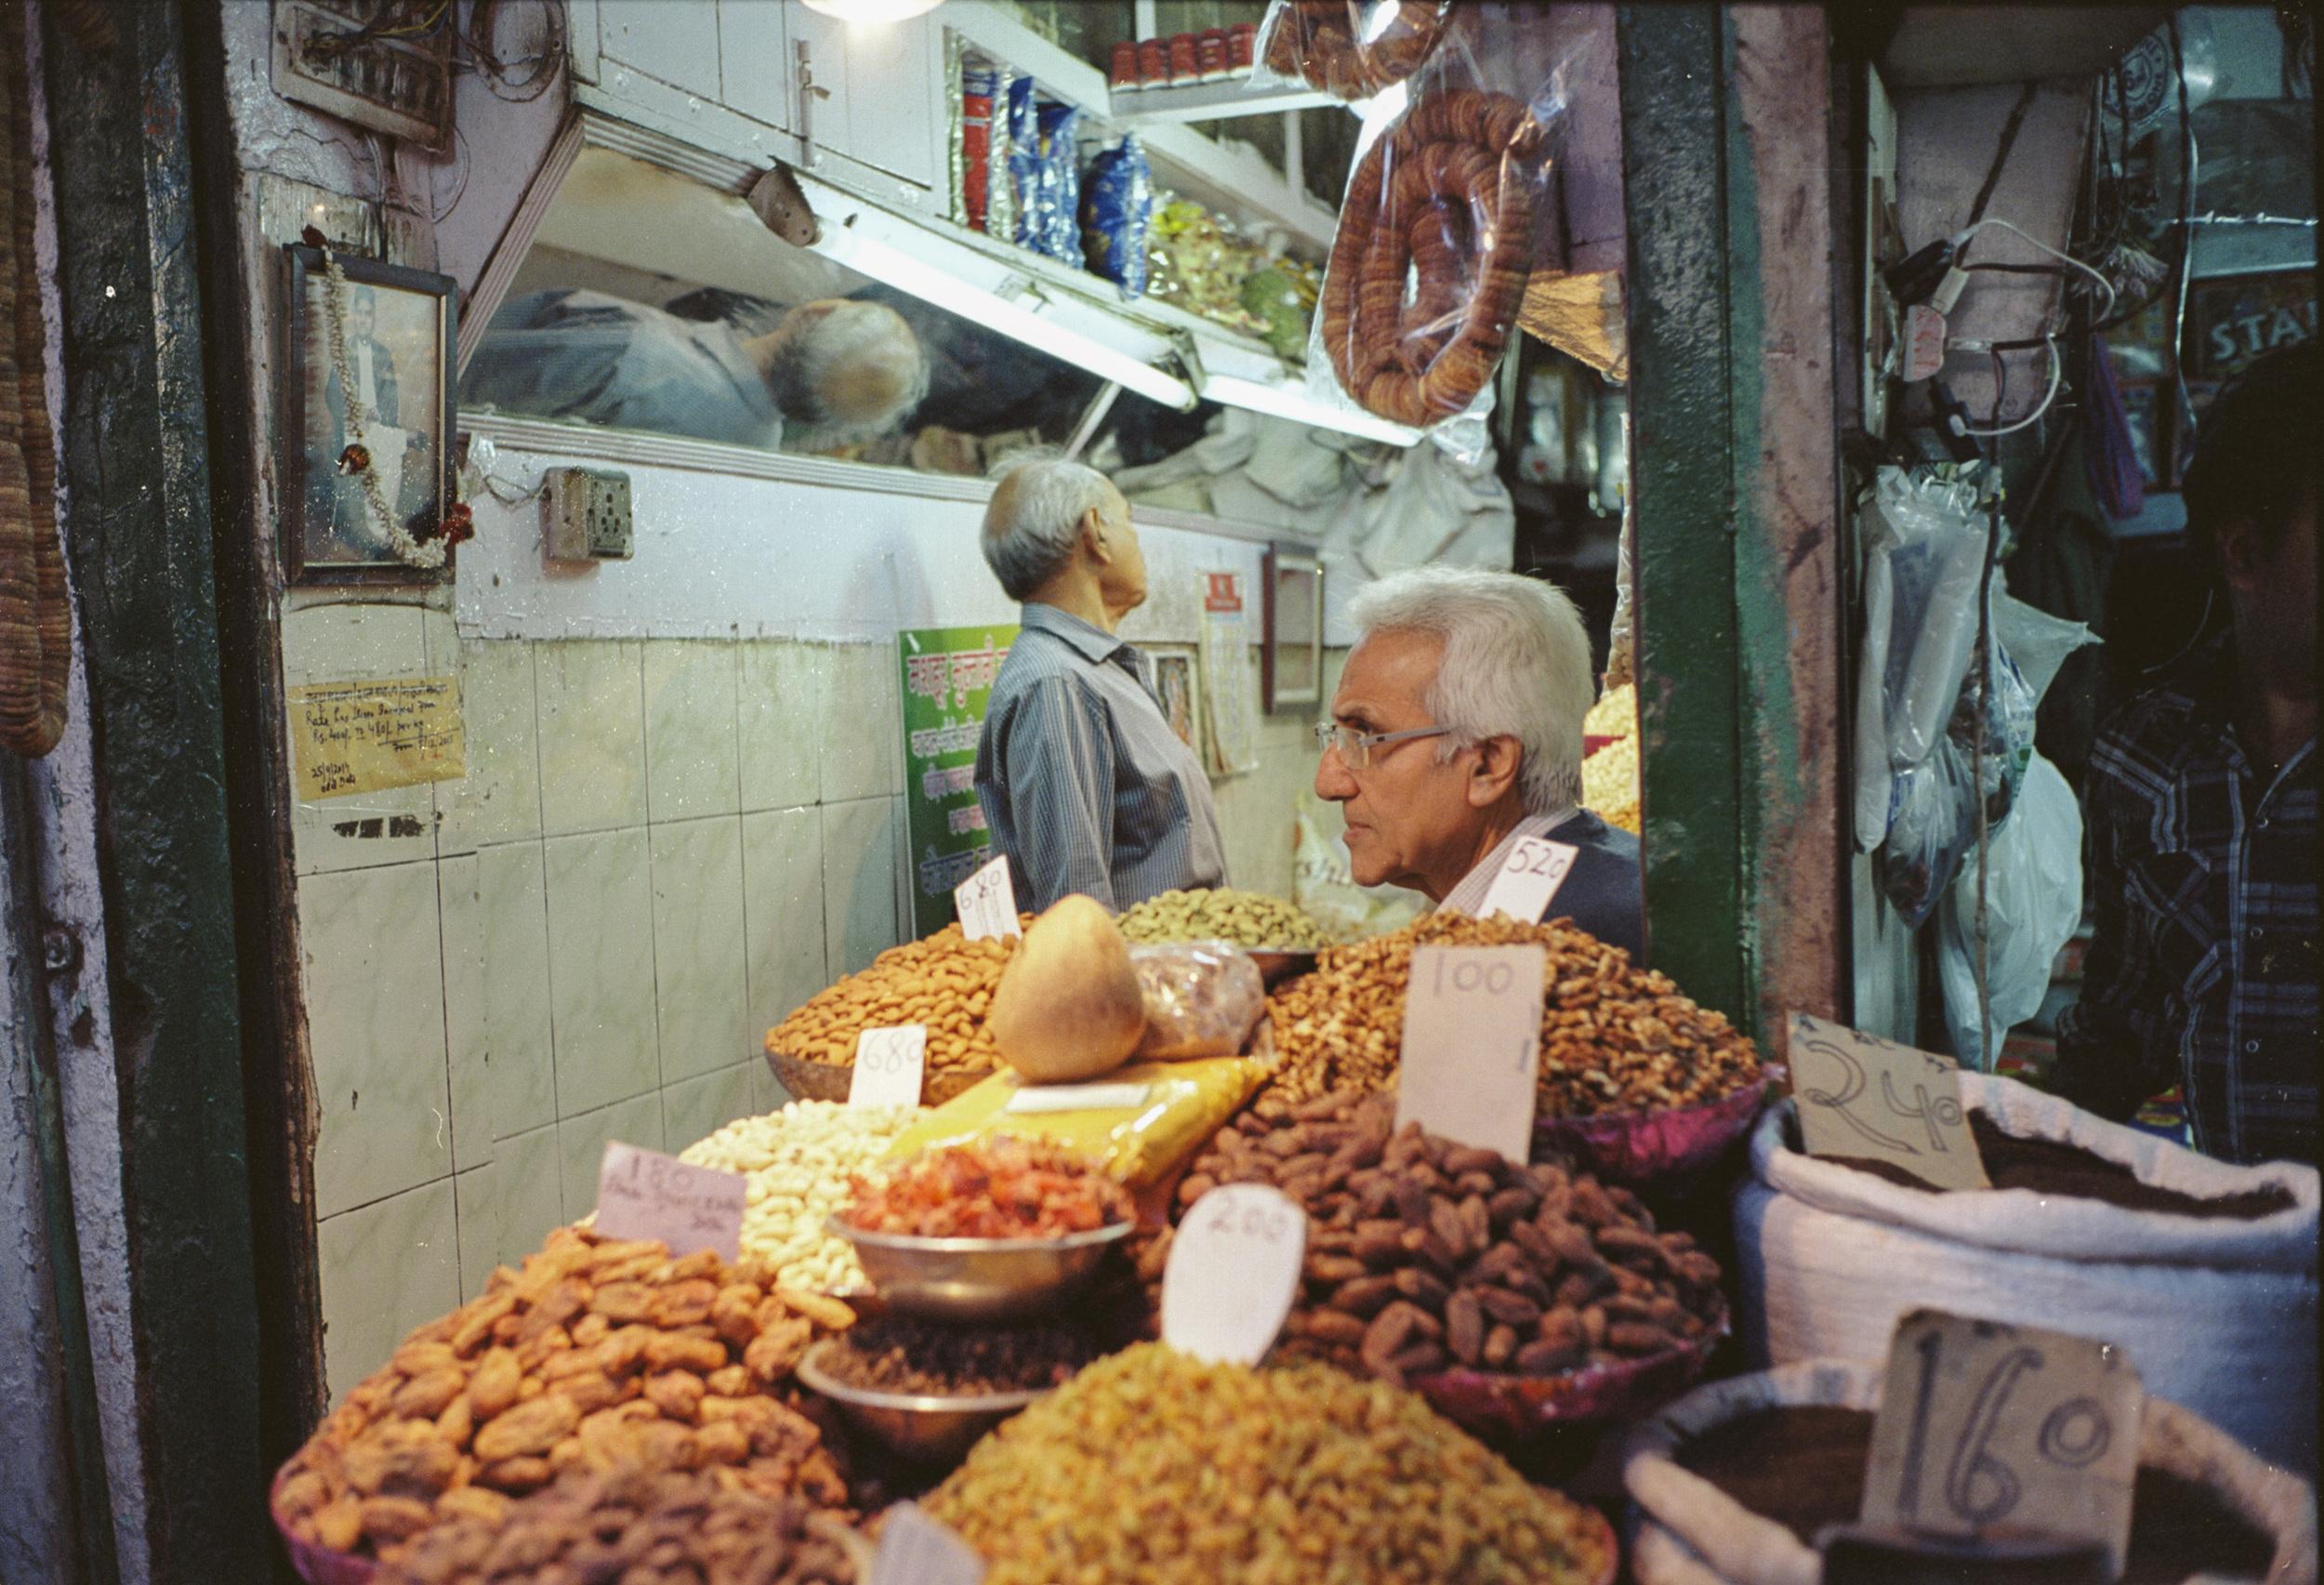 72-F17_Spice Market, Delhi, India 2016-14.jpg